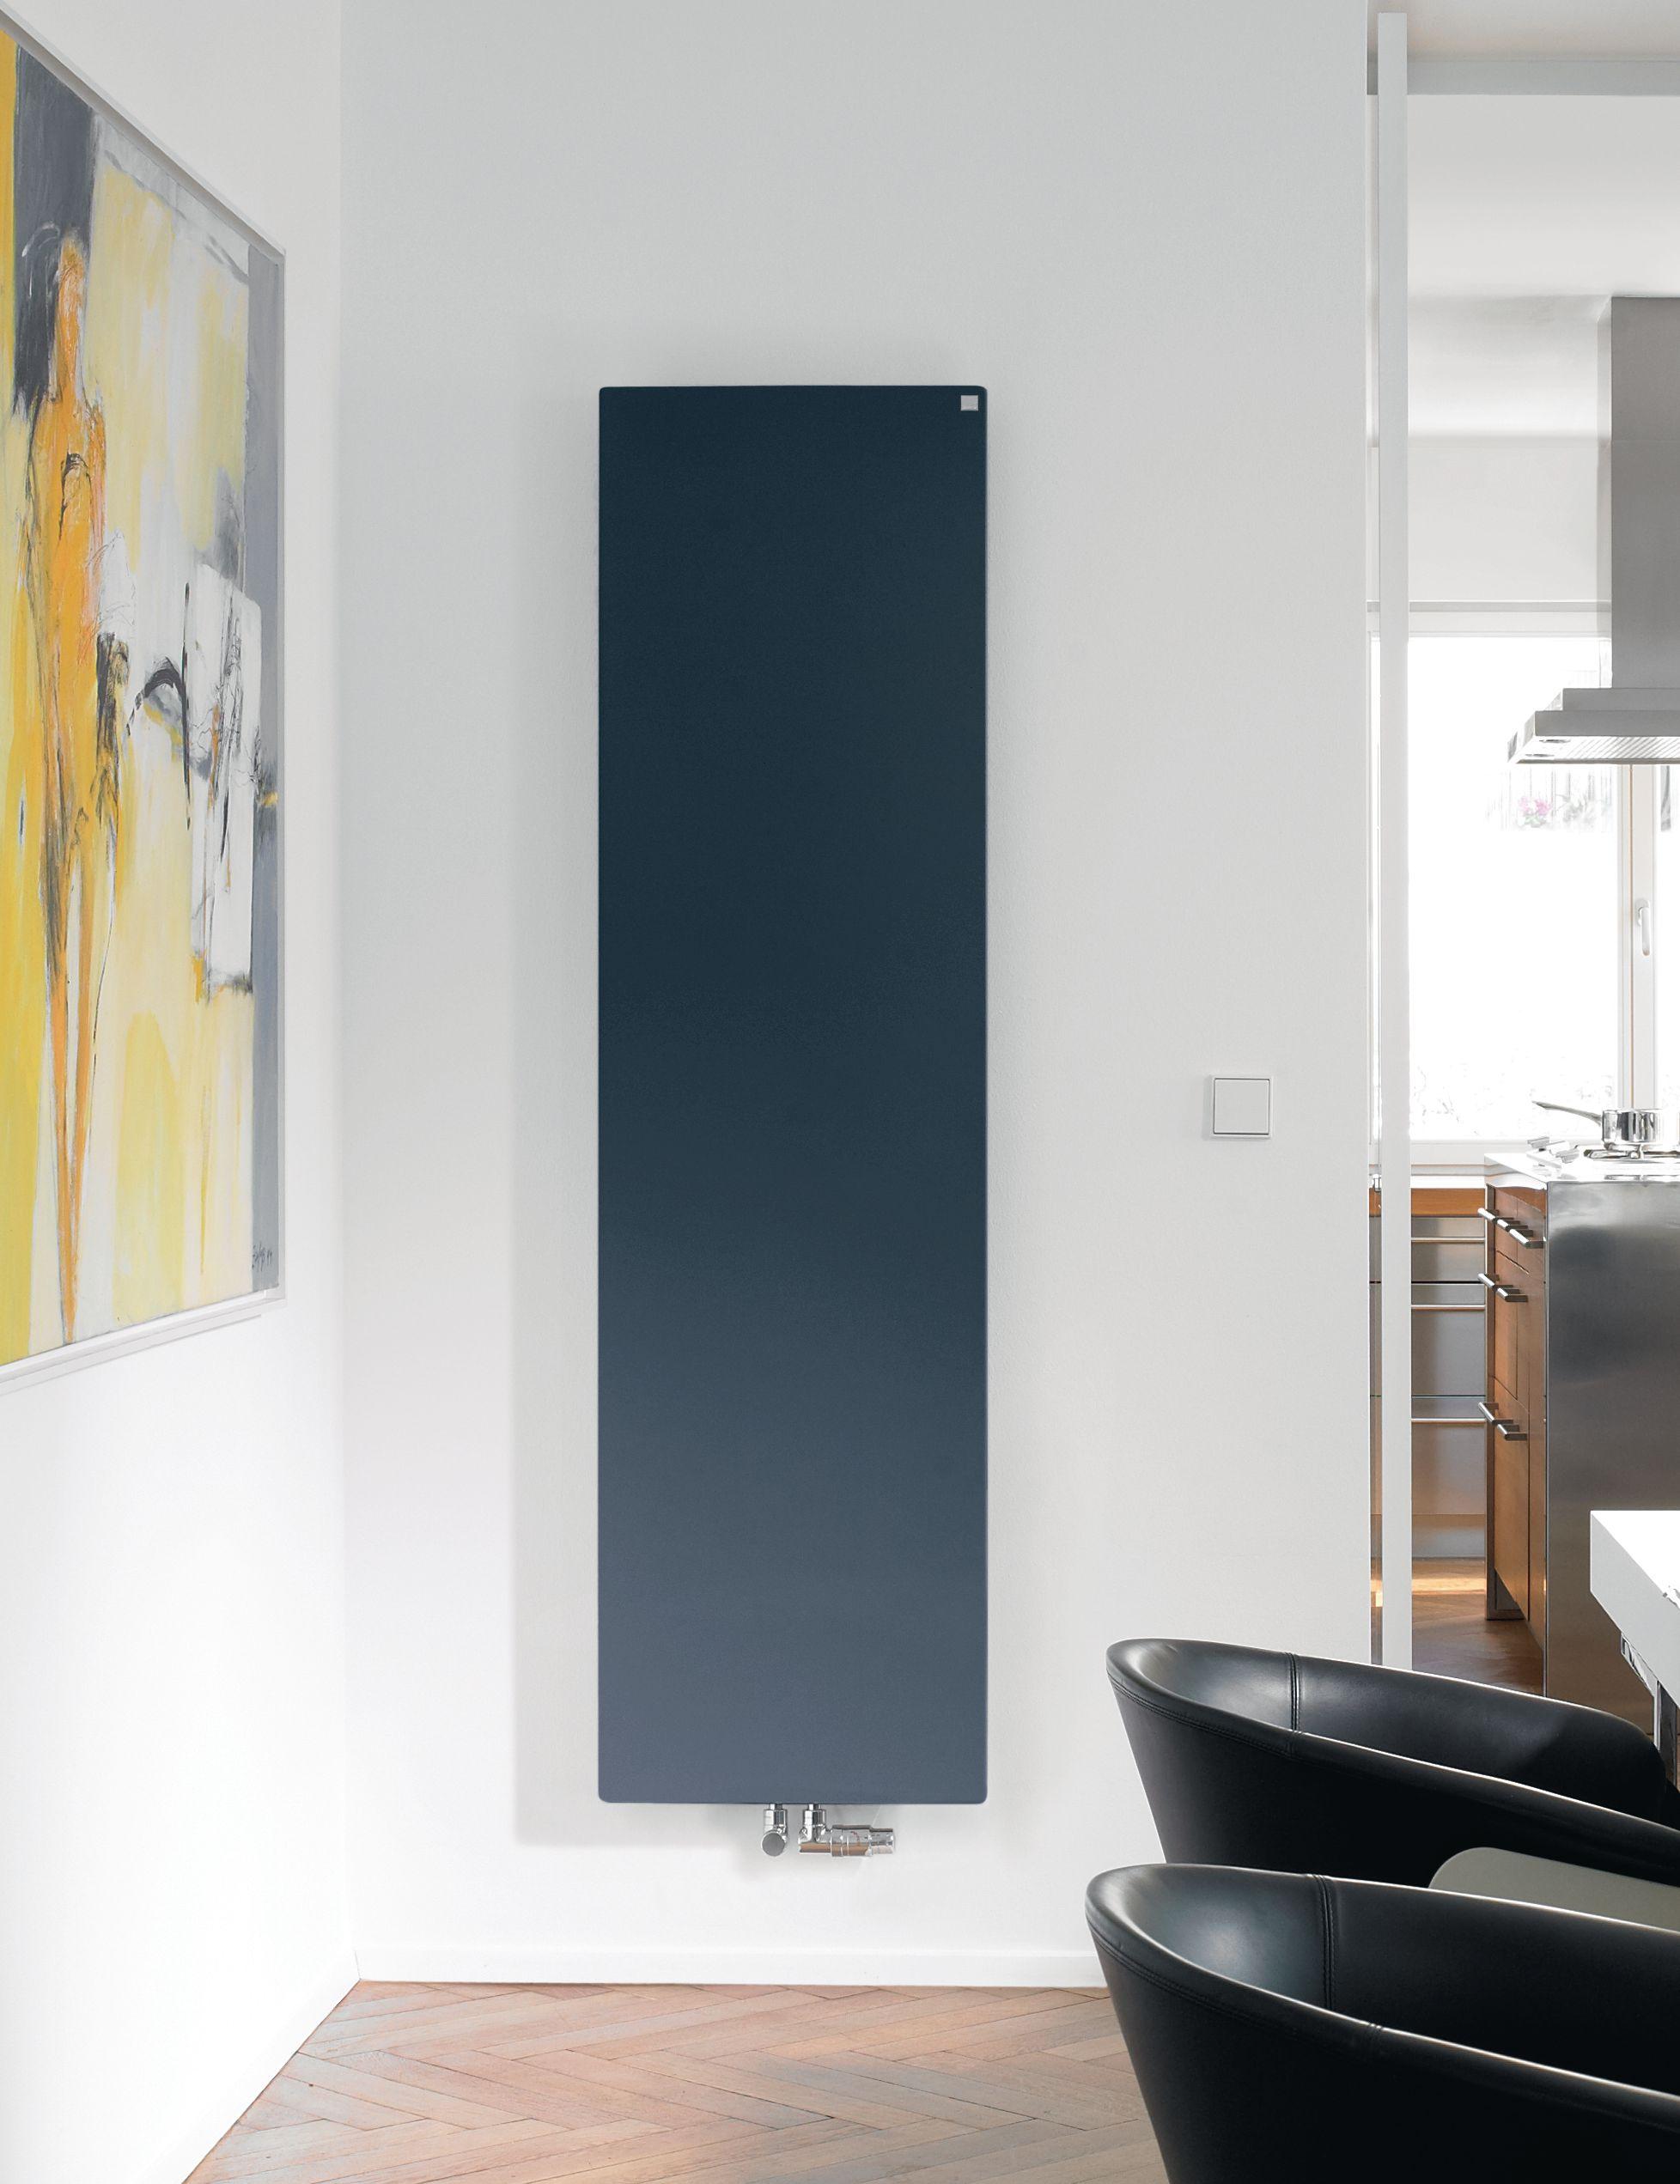 Zehnder fina radiateurs design - Radiateur plinthe zehnder ...